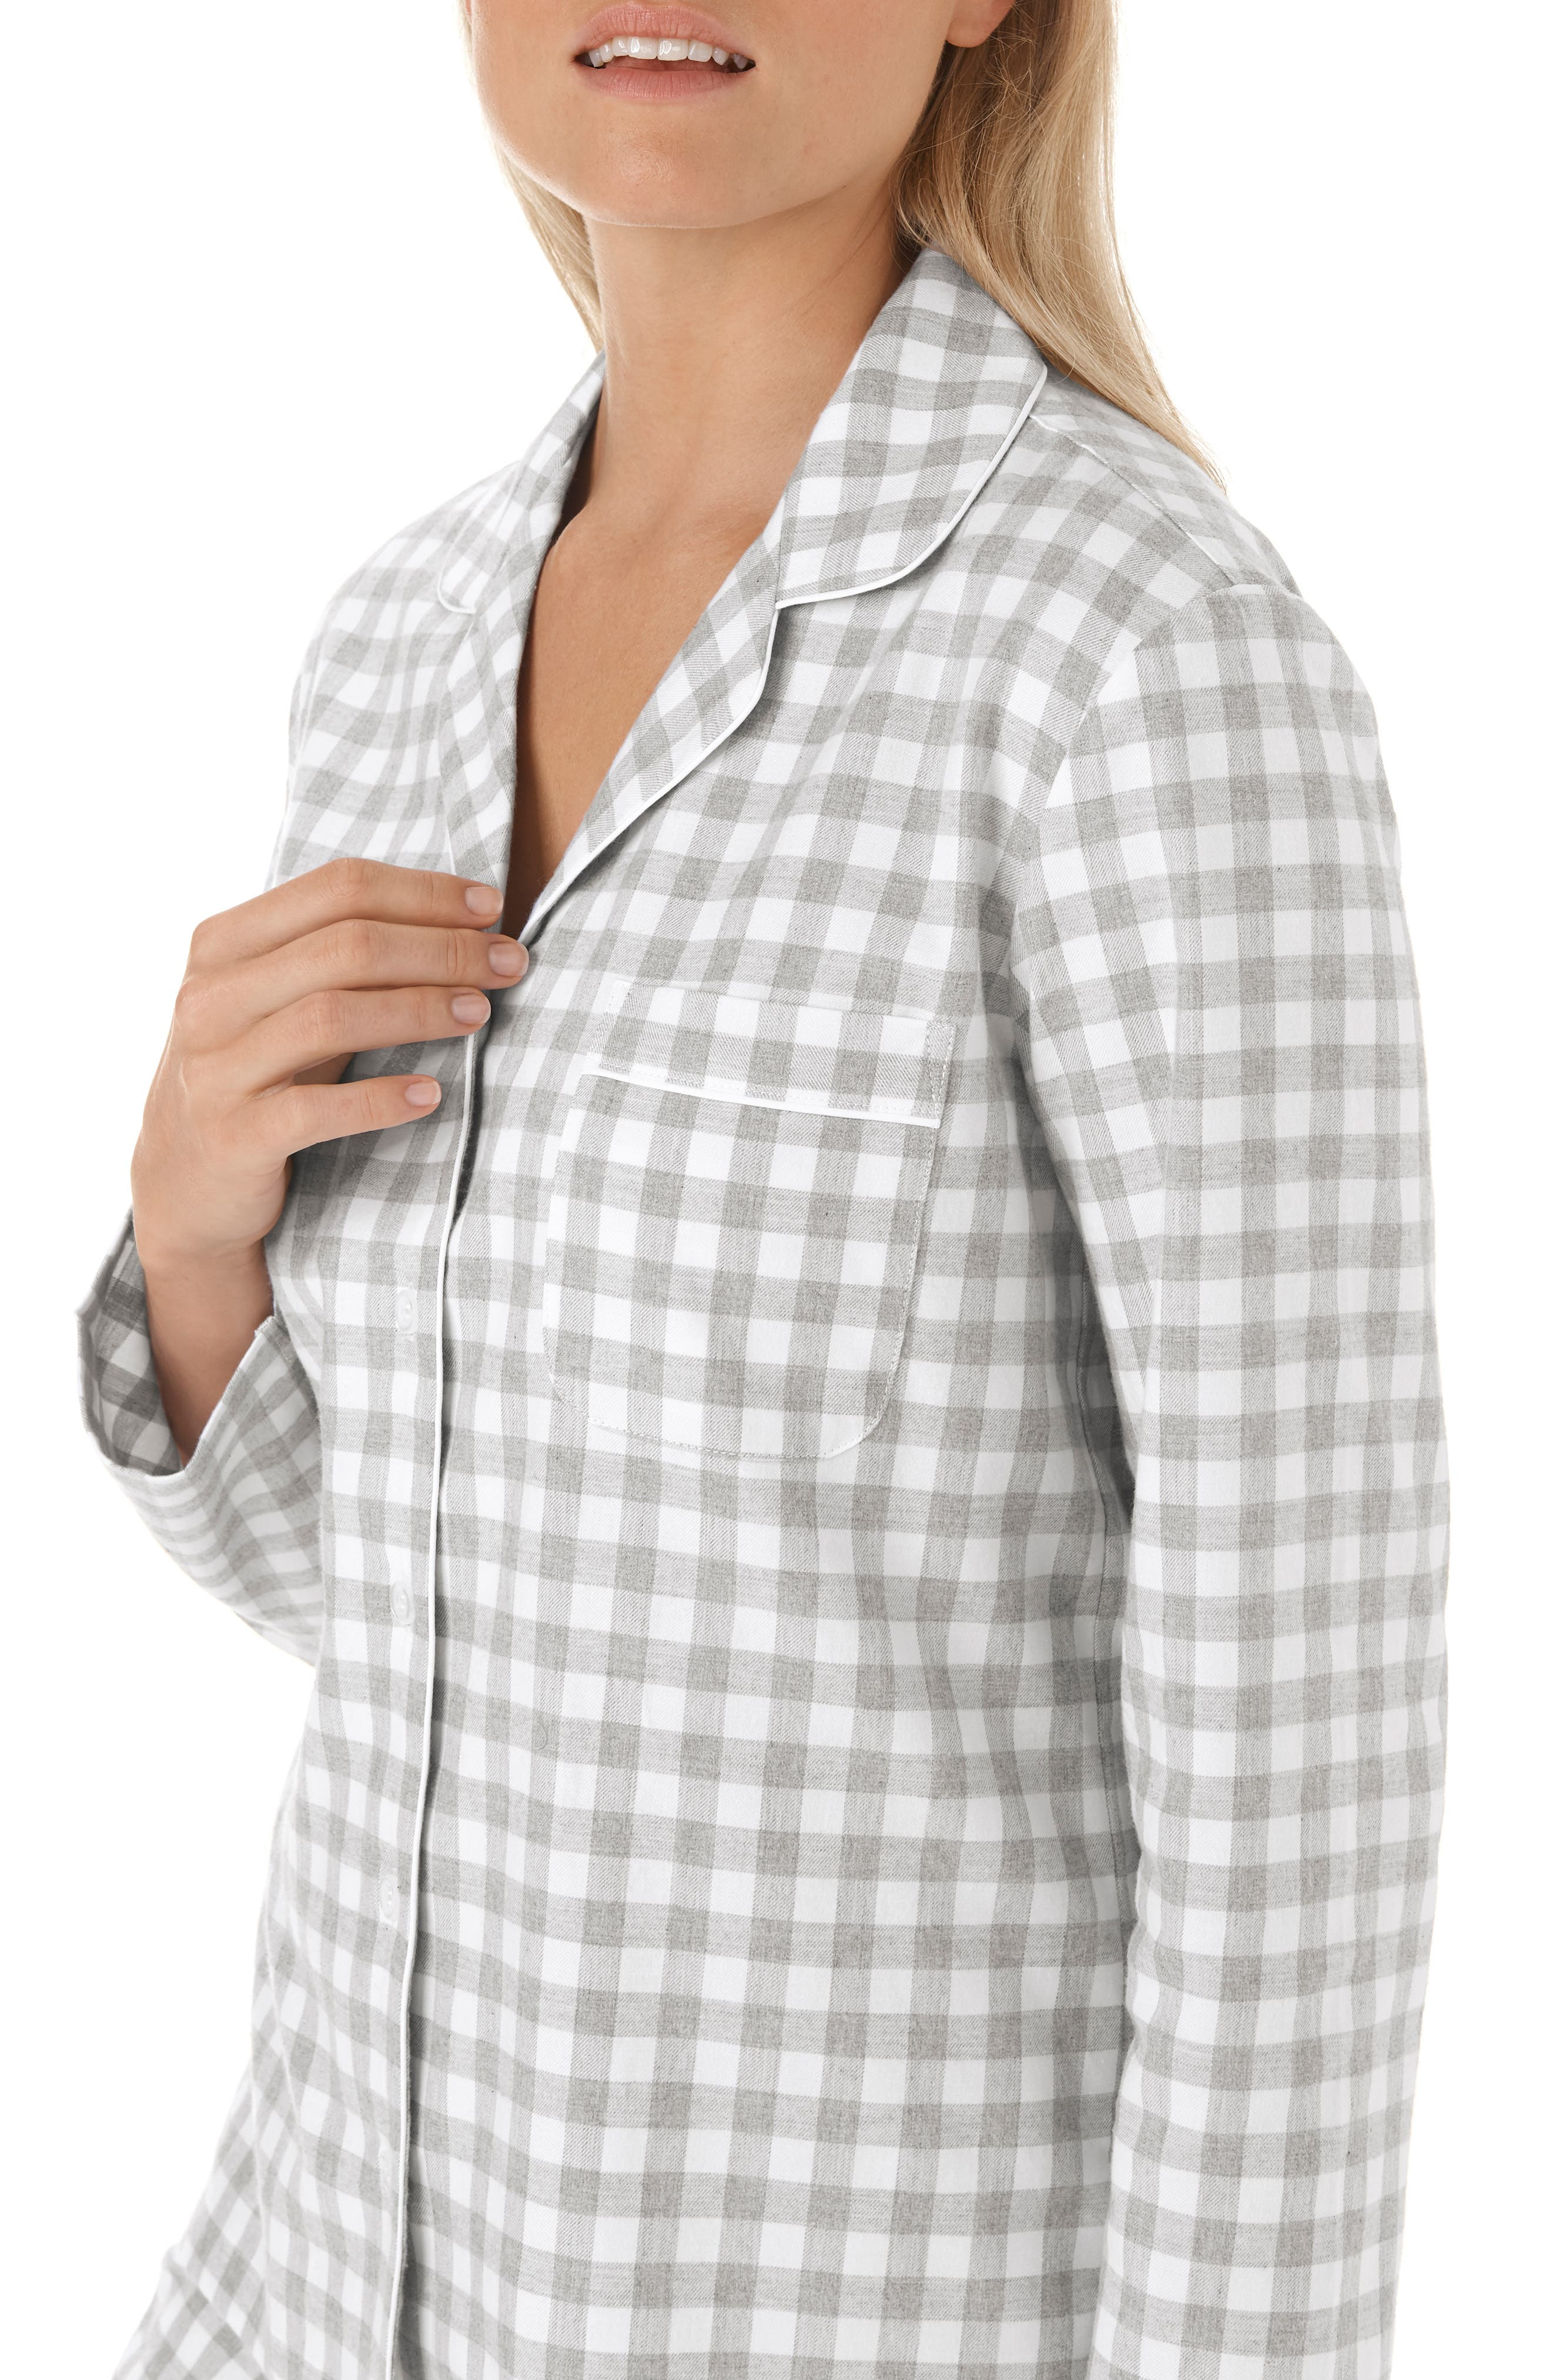 Gingham Check Pajamas,                             Alternate thumbnail 4, color,                             GREY/ WHITE GINGHAM